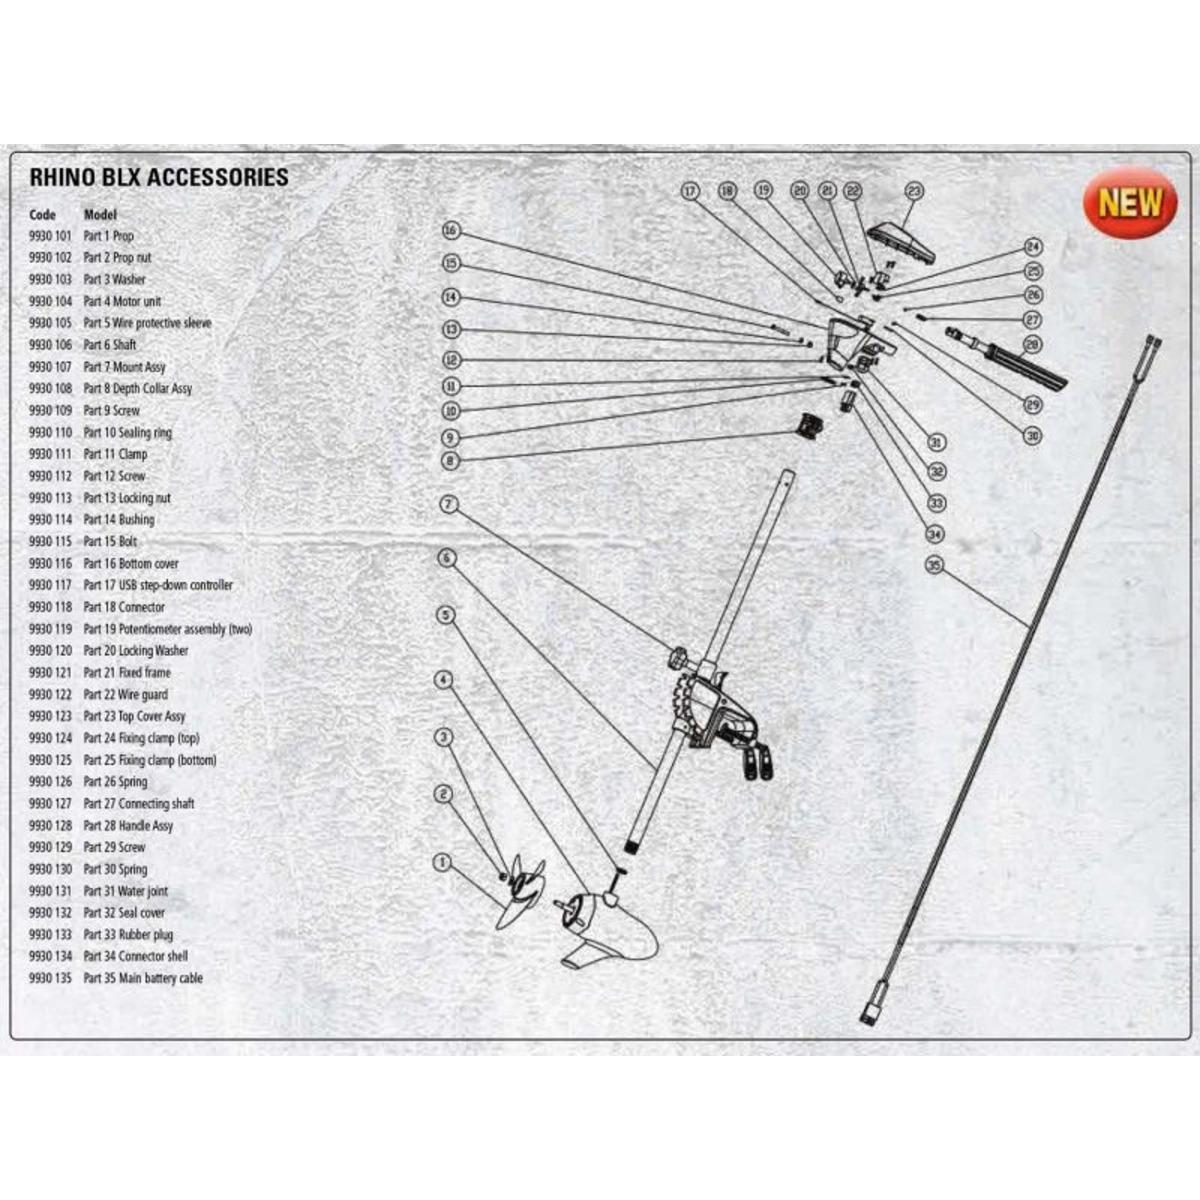 Rhino Feder für Elektromotore BLX 70 - Teil 26